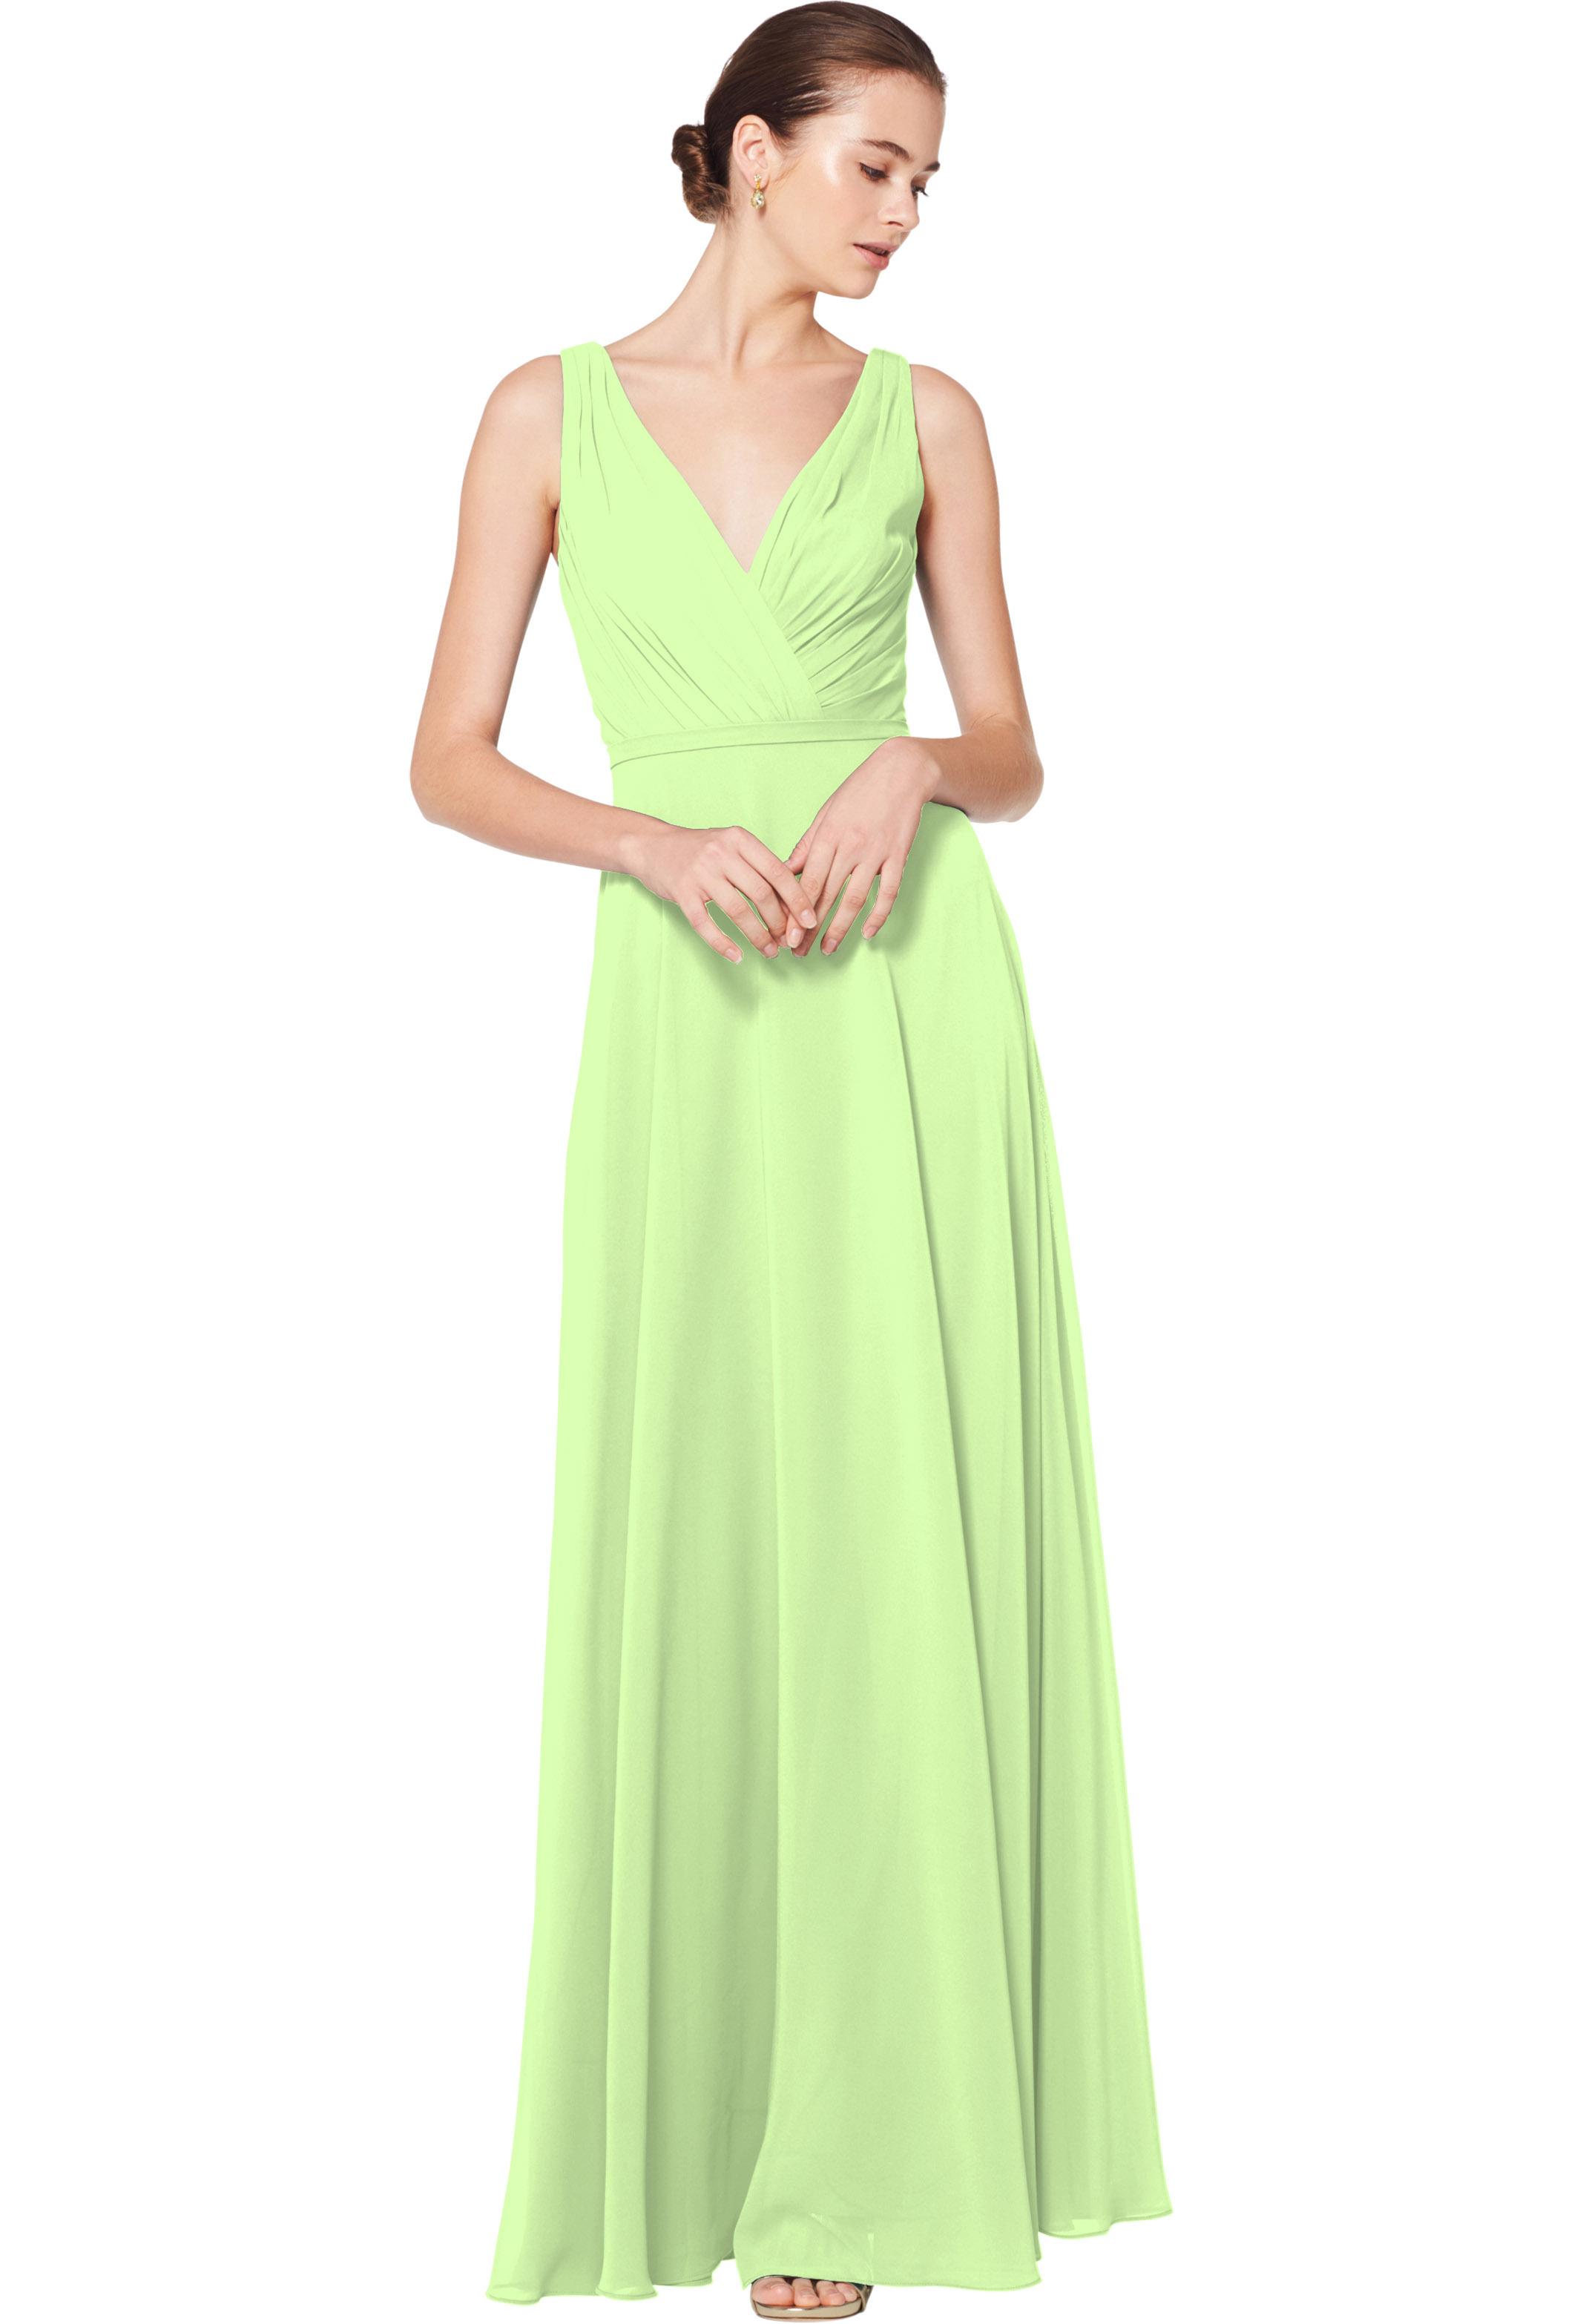 Bill Levkoff PISTACHIO Chiffon Sleeveless A-line gown, $180.00 Front